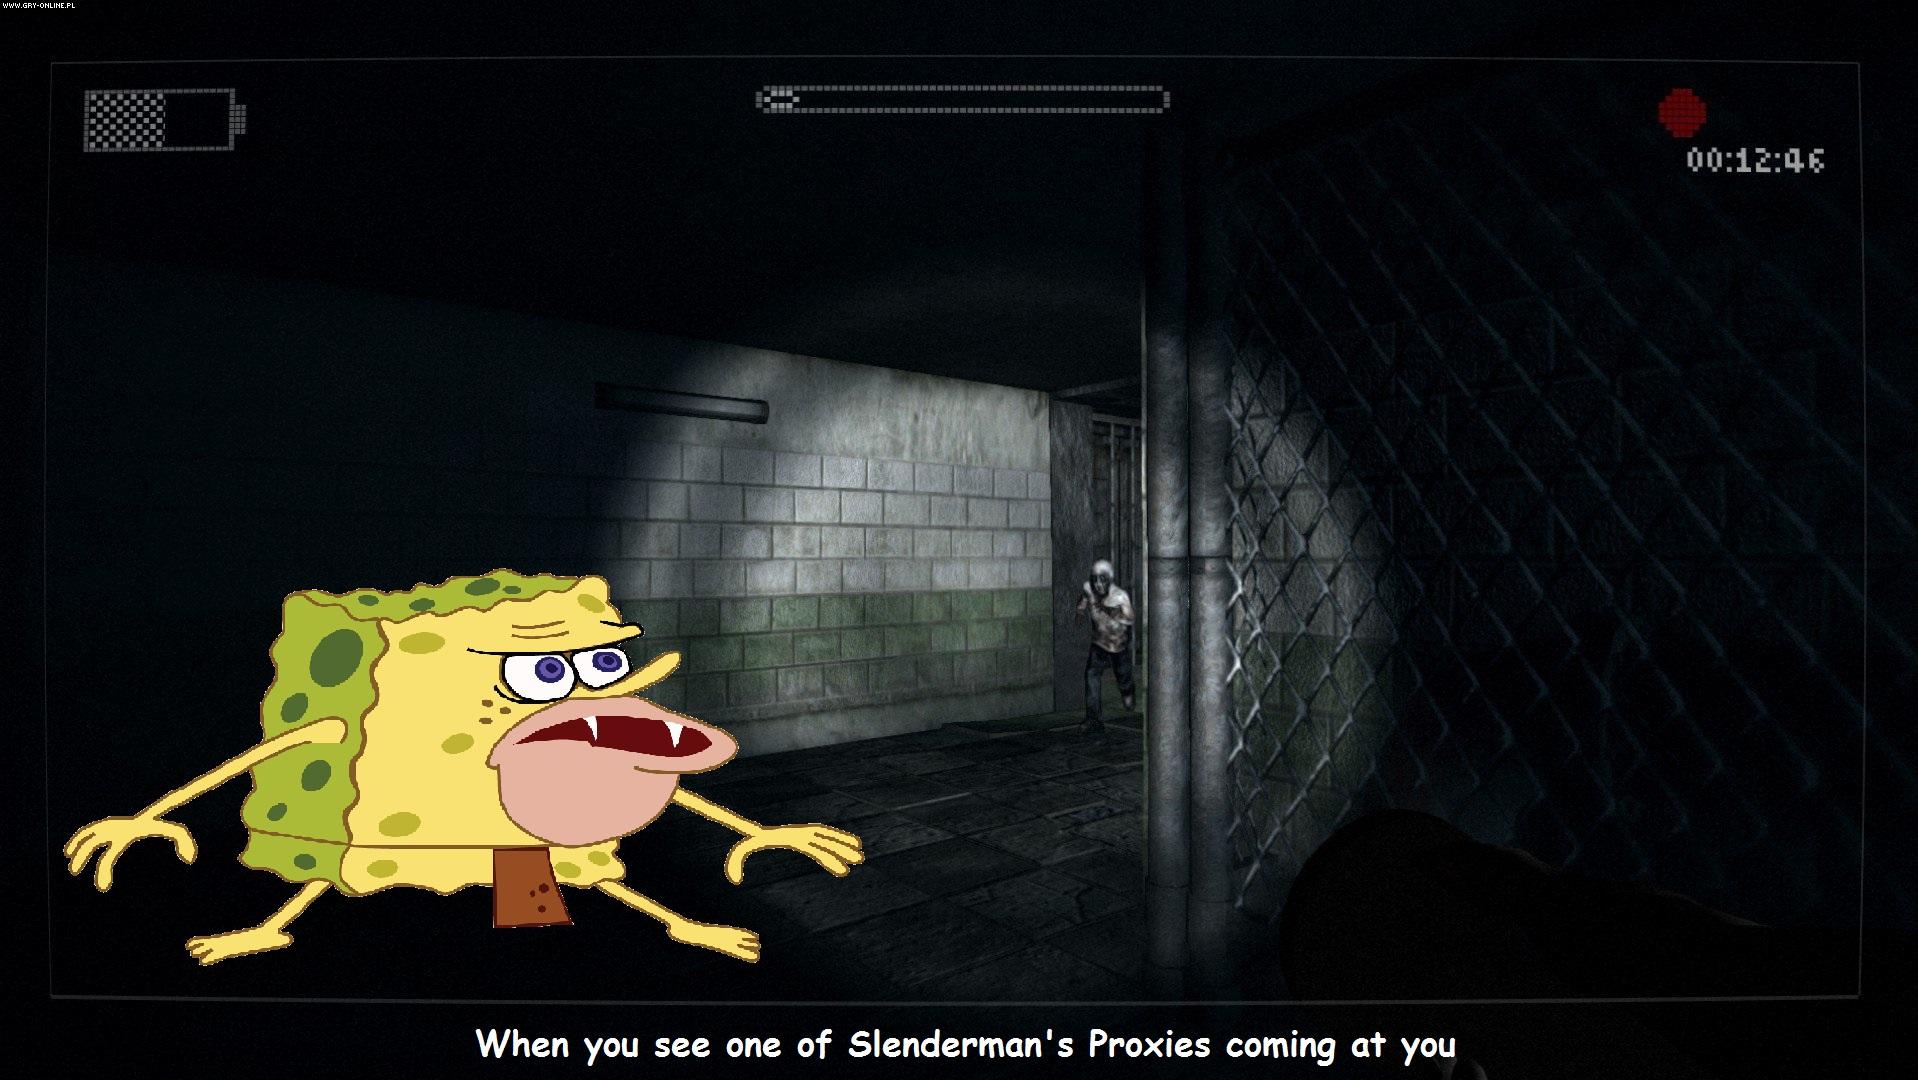 Man Cave Meme : Caveman spongebob meme by artzume on deviantart